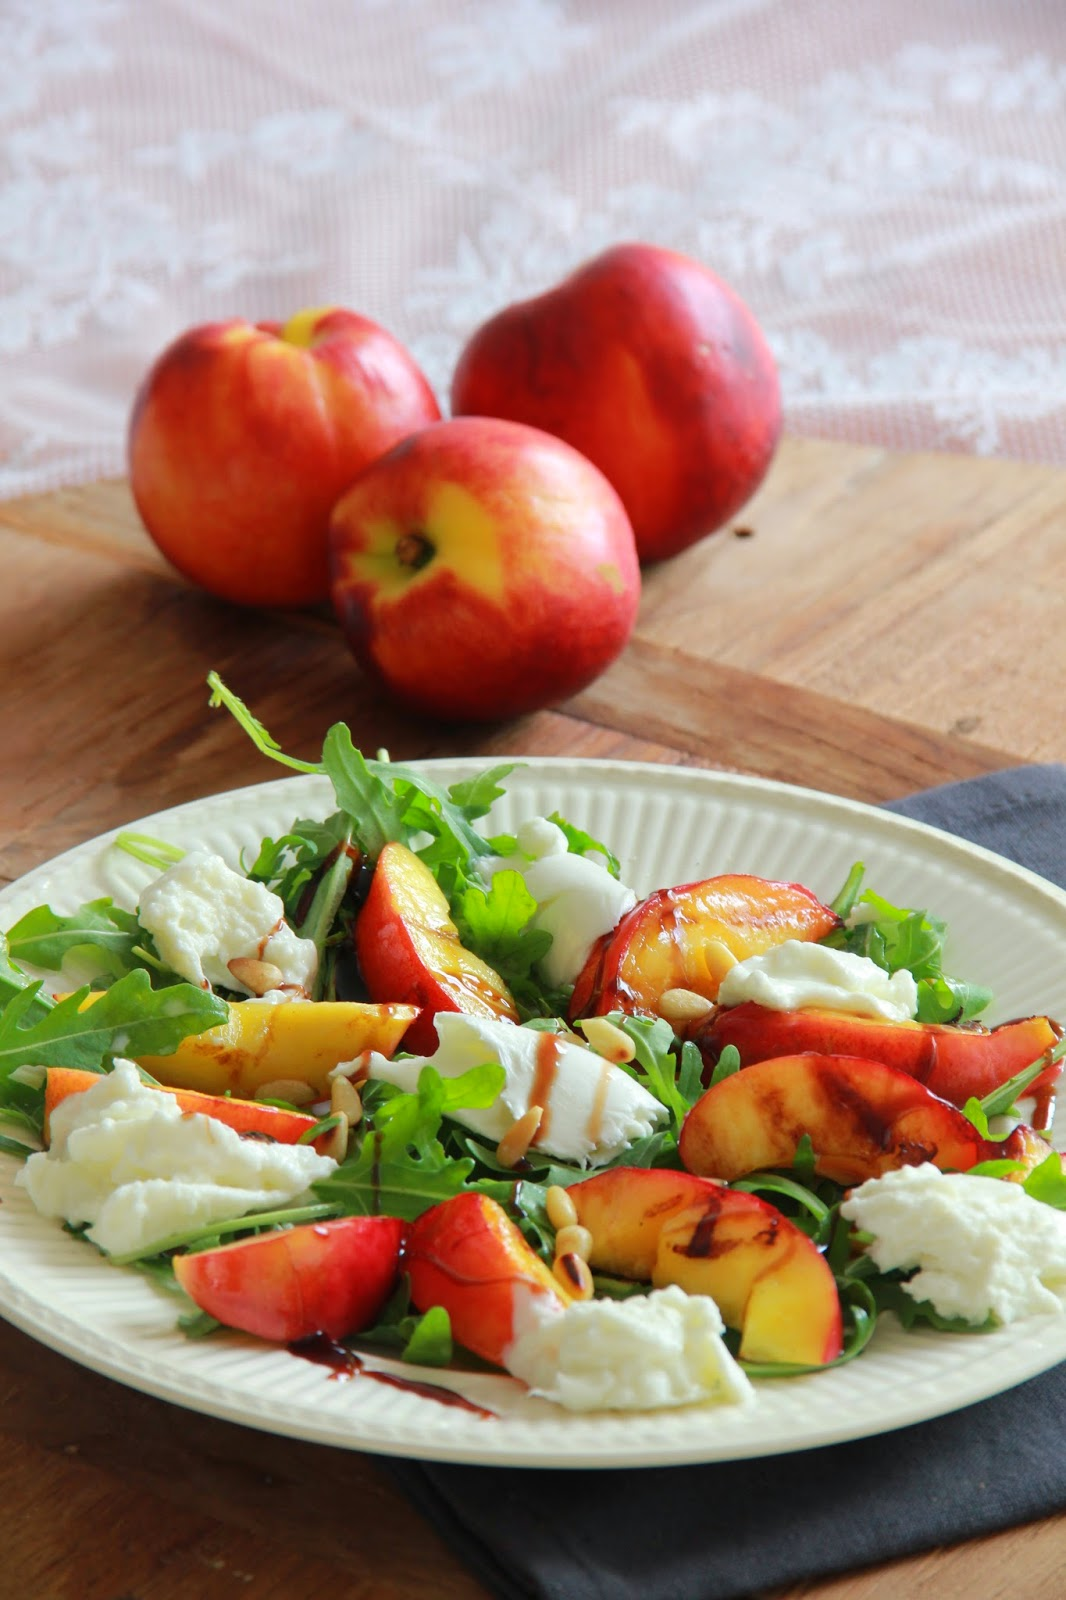 Salade met gegrilde nectarine & buffelmozzarella - www.desmaakvancecile.com